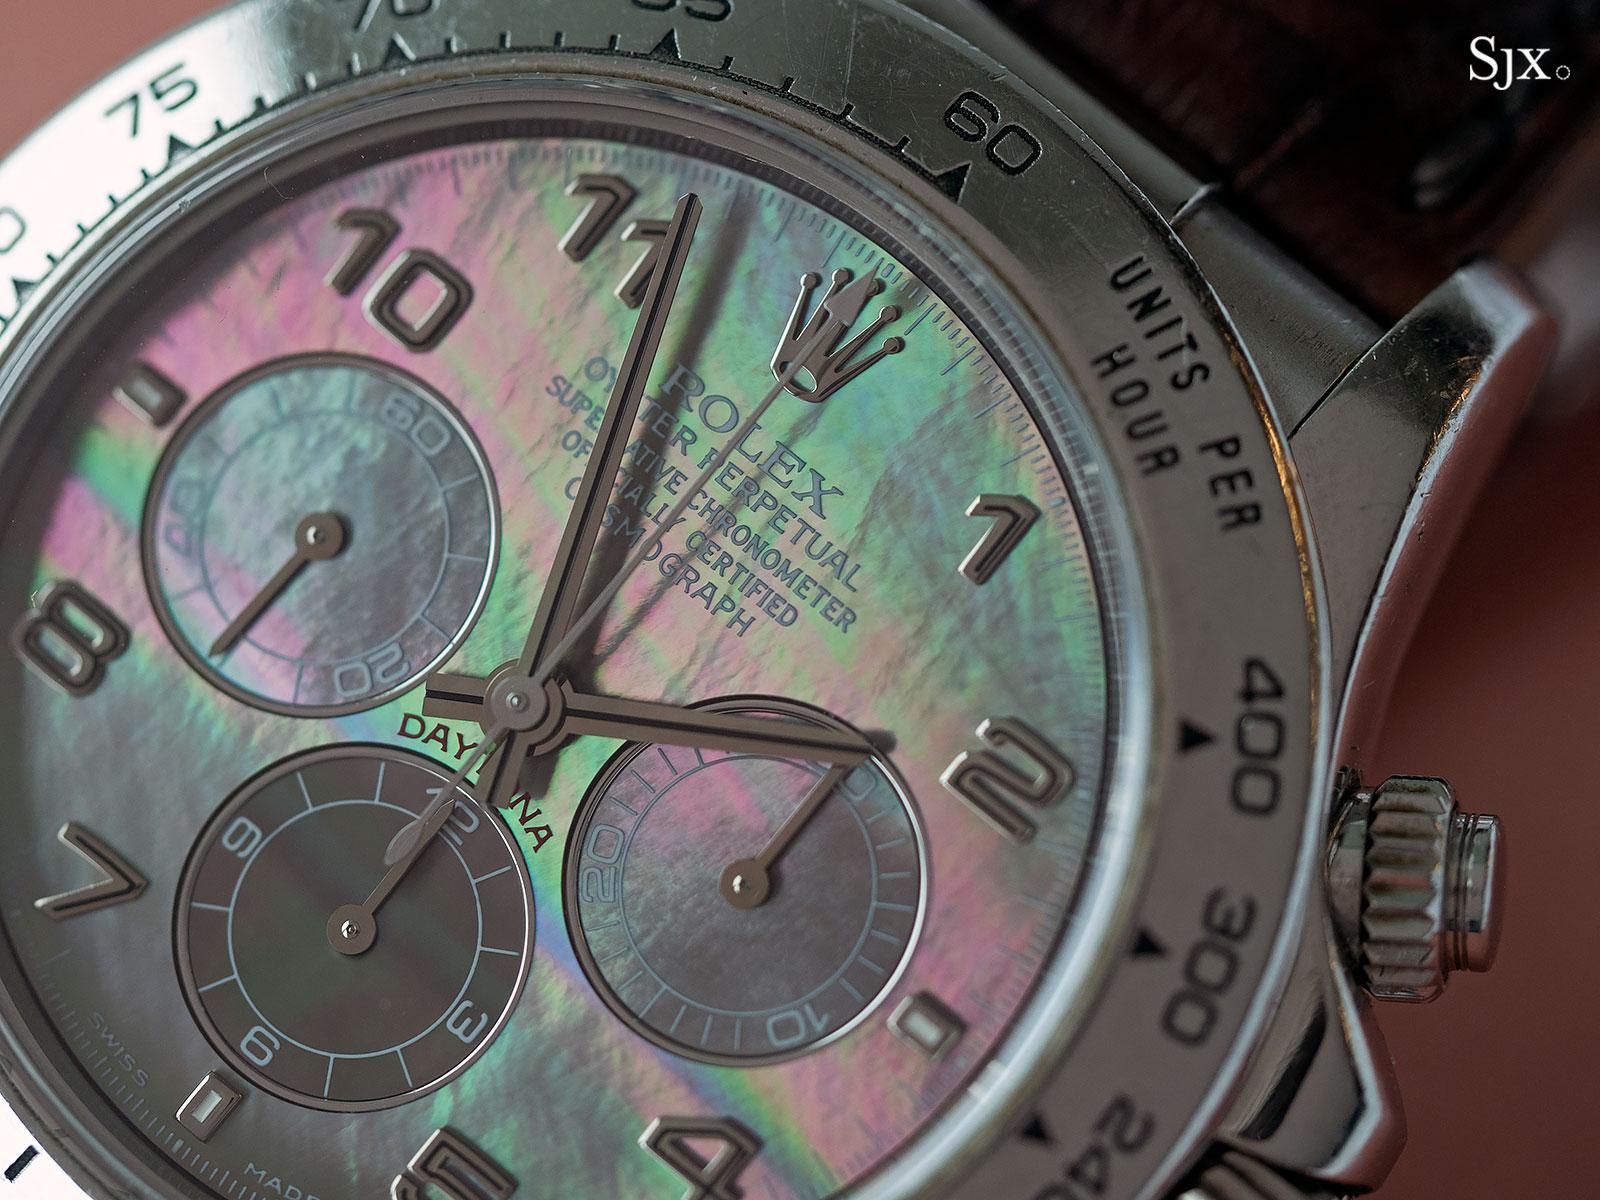 Rolex Daytona Zenith platinum 16516 3